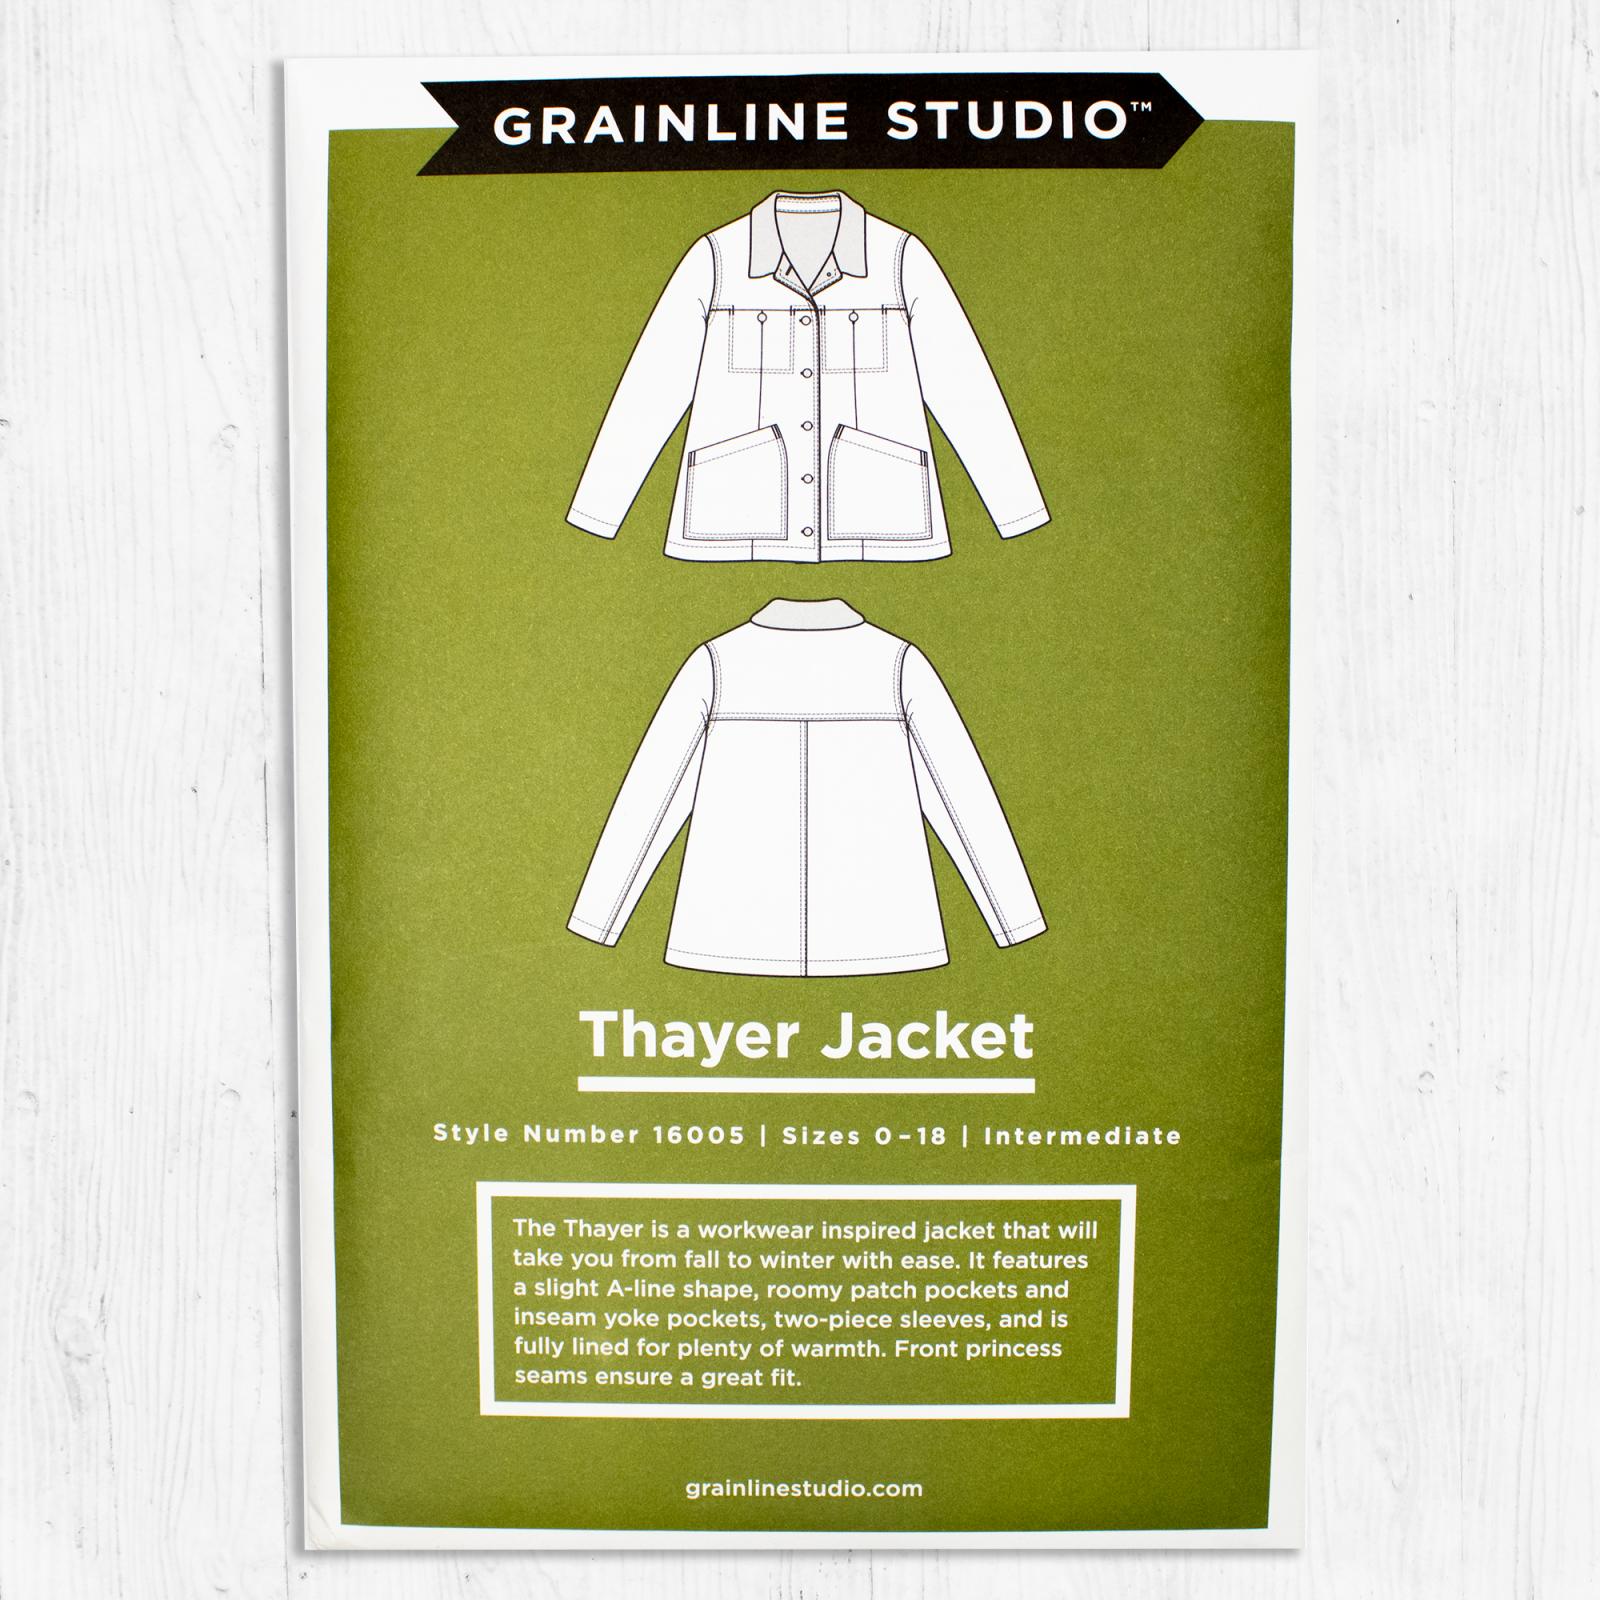 Grainline Studios - Thayer Jacket